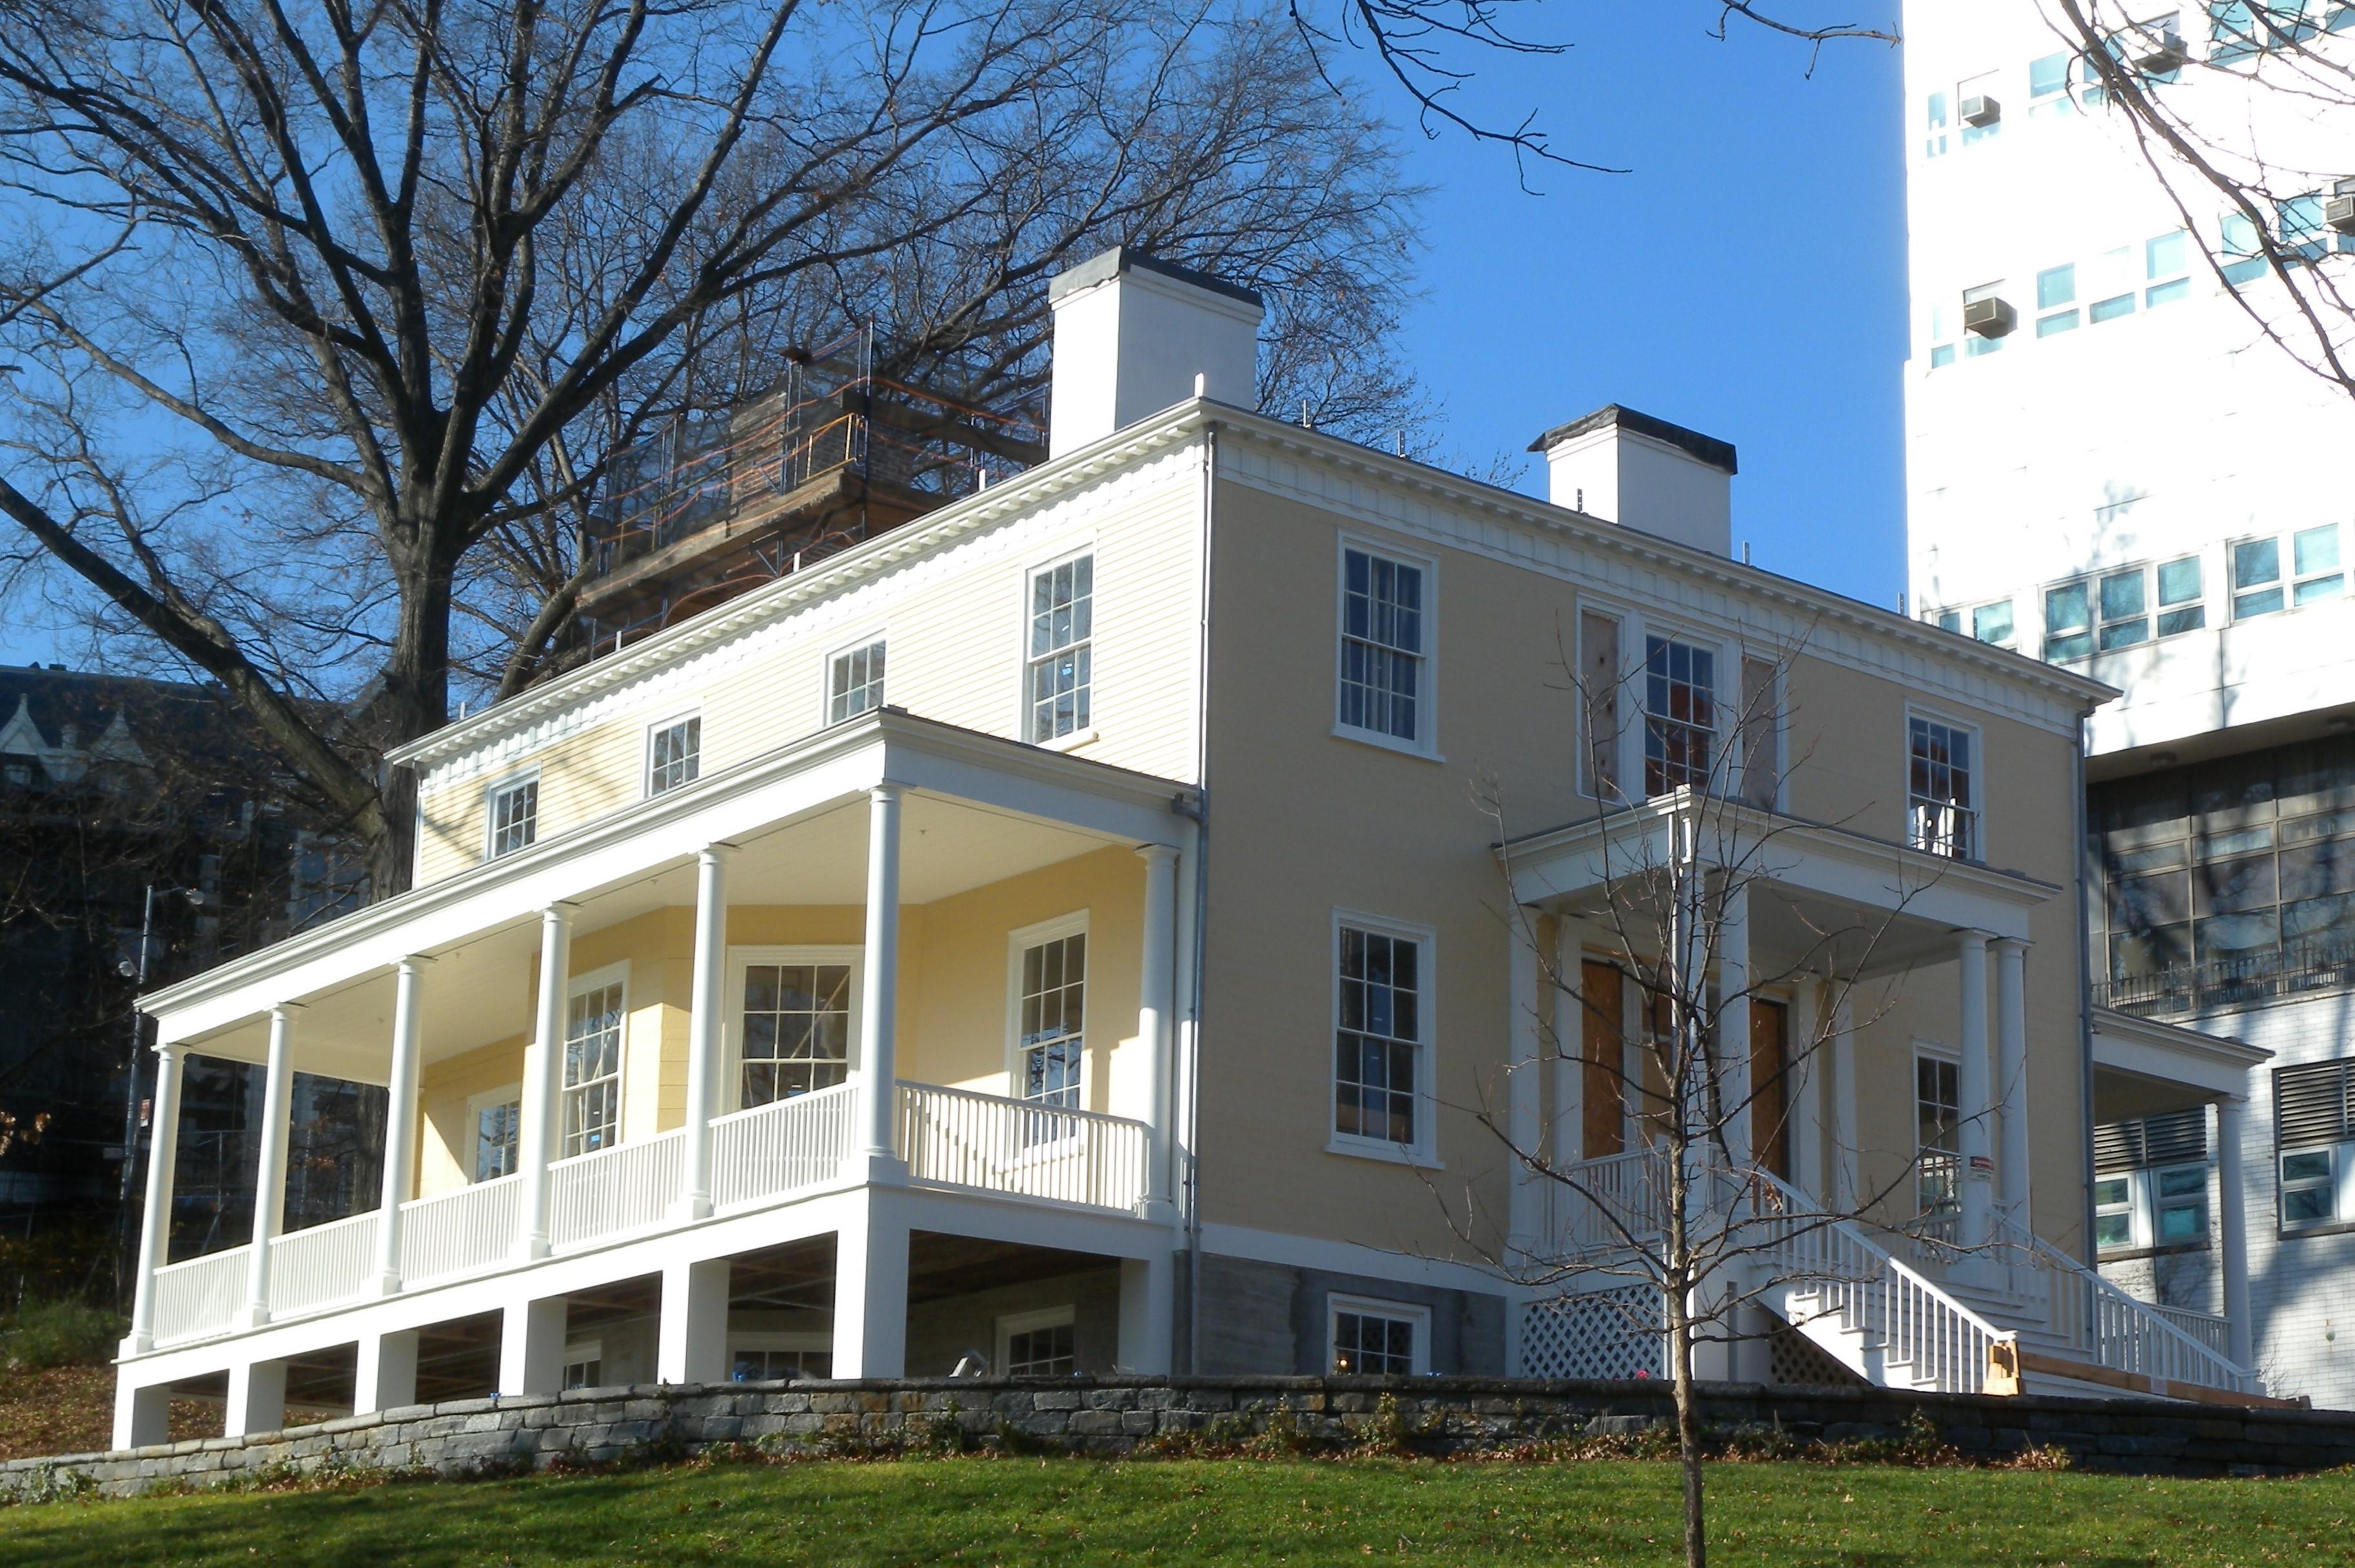 Hamilton Grange National Memorial - Wikipedia